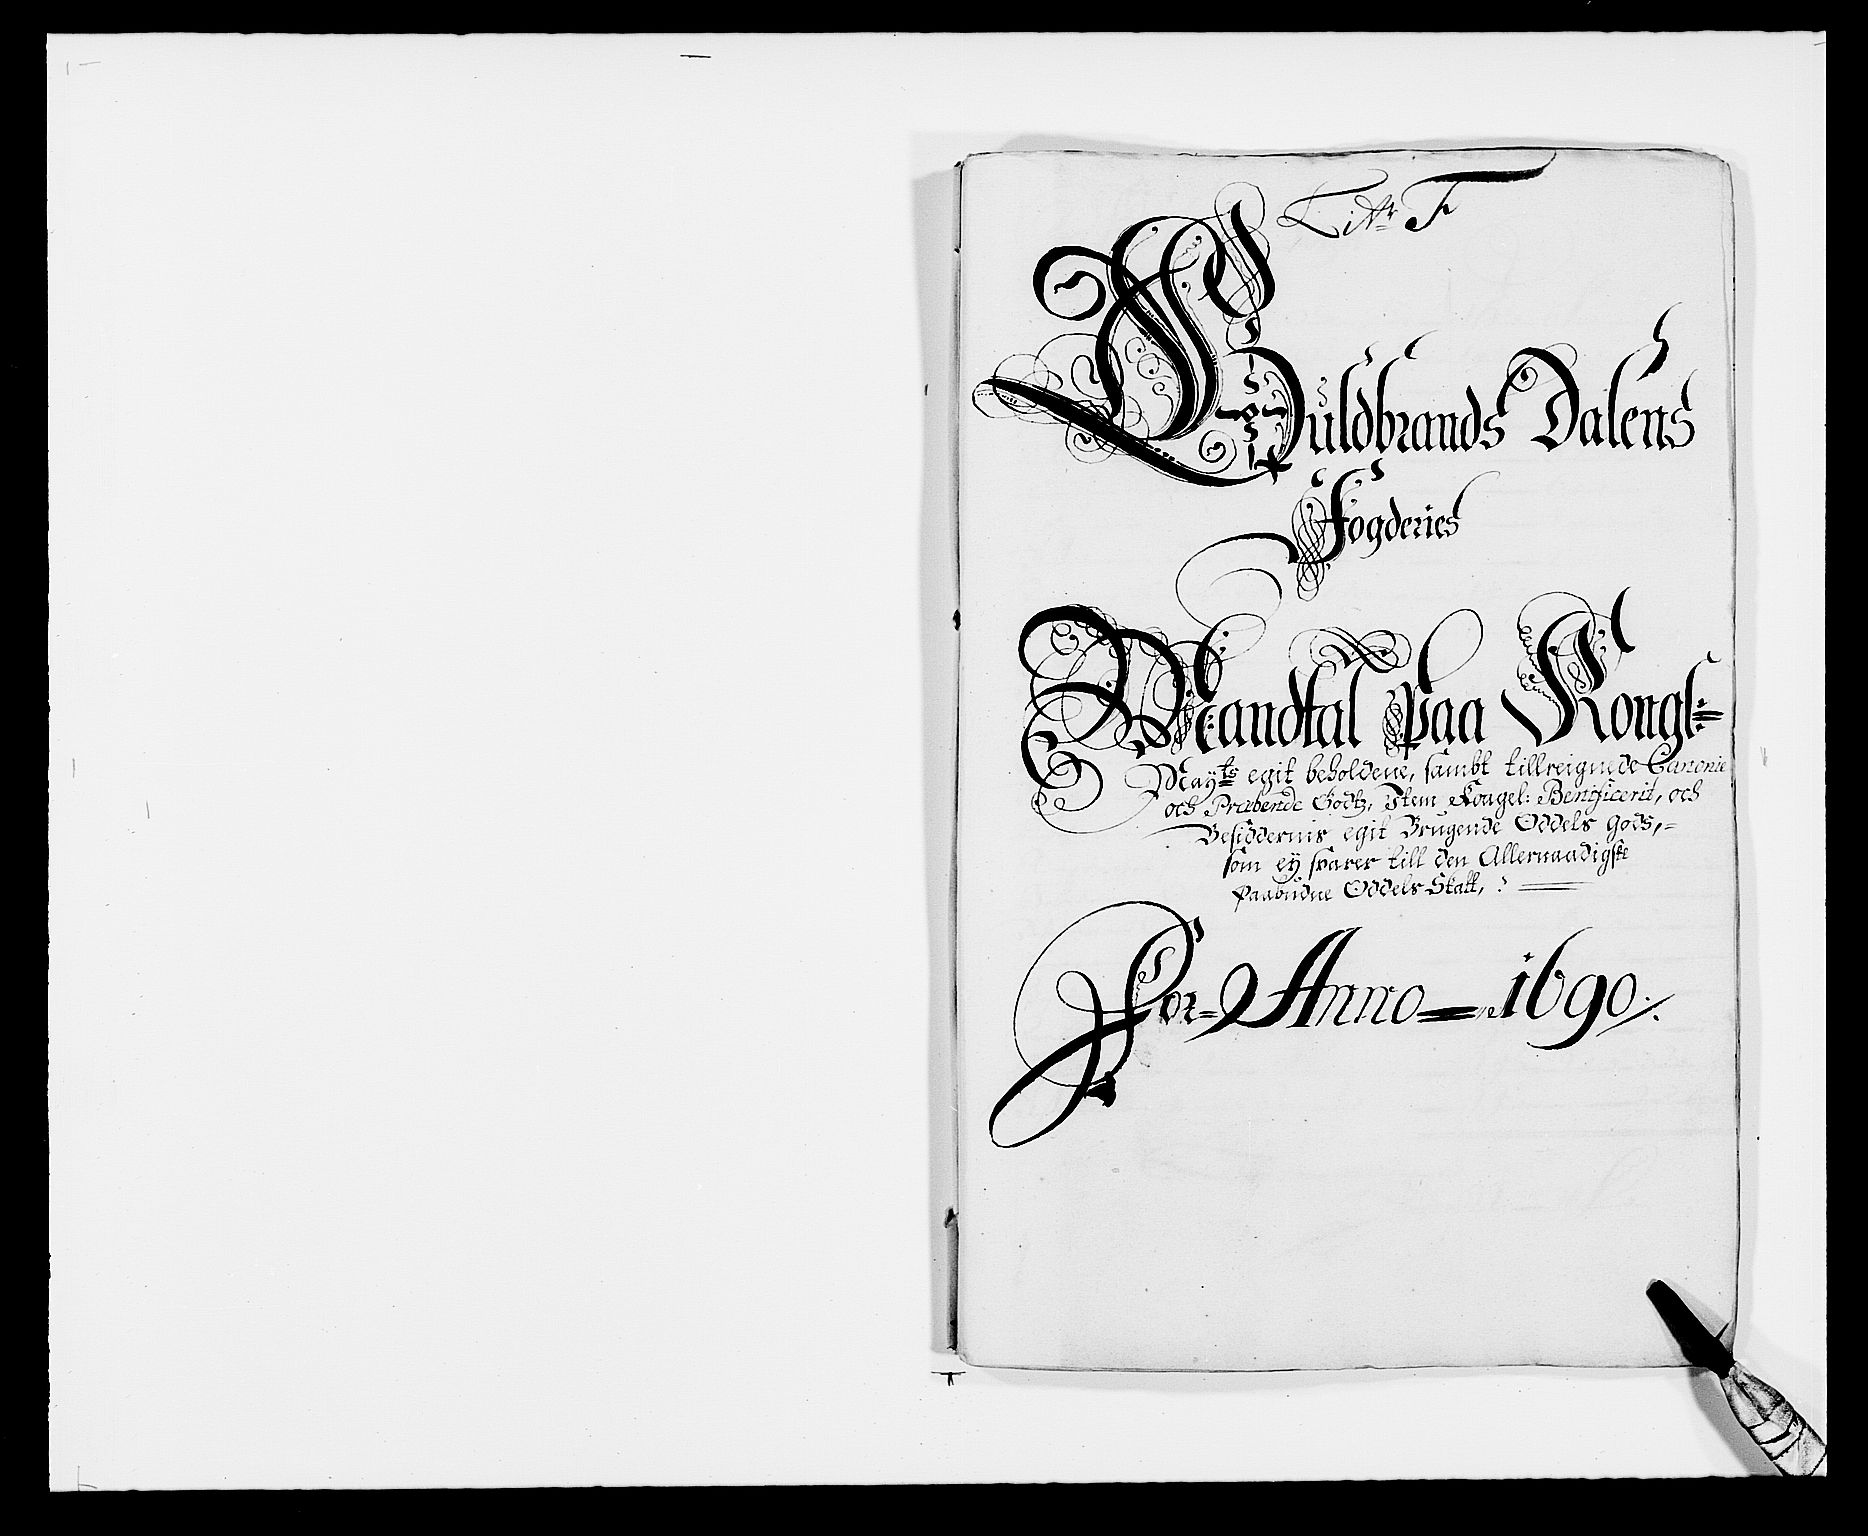 RA, Rentekammeret inntil 1814, Reviderte regnskaper, Fogderegnskap, R17/L1165: Fogderegnskap Gudbrandsdal, 1690-1692, s. 106